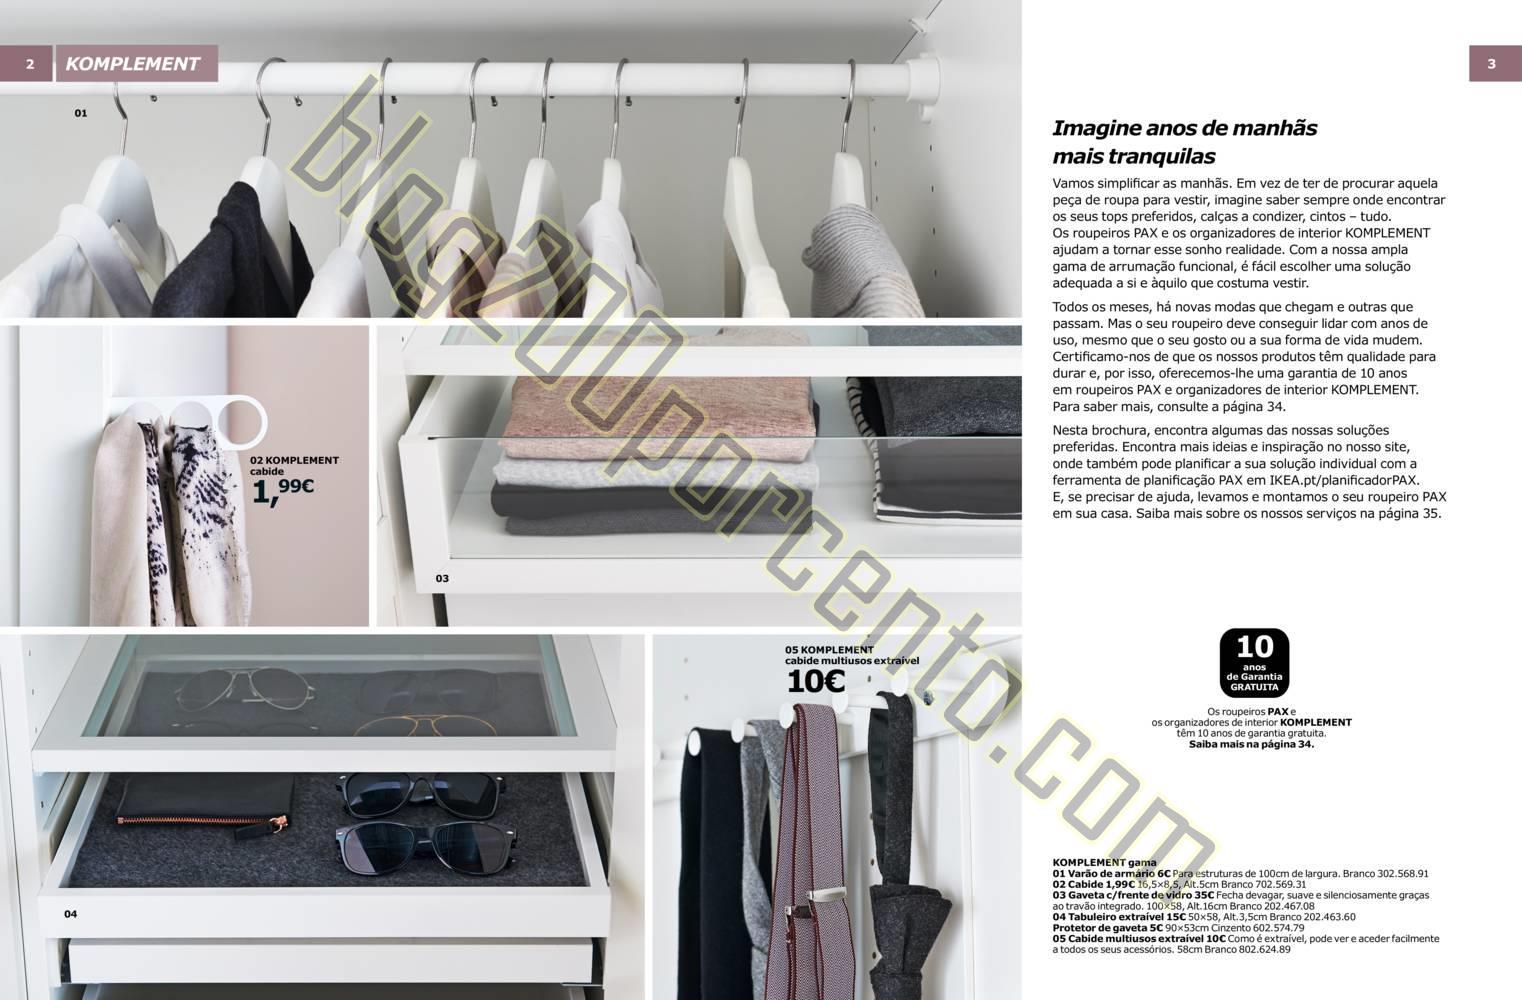 Novo cat logo ikea roupeiros 2016 promo es at 30 junho - Ikea catalogo 2016 ...